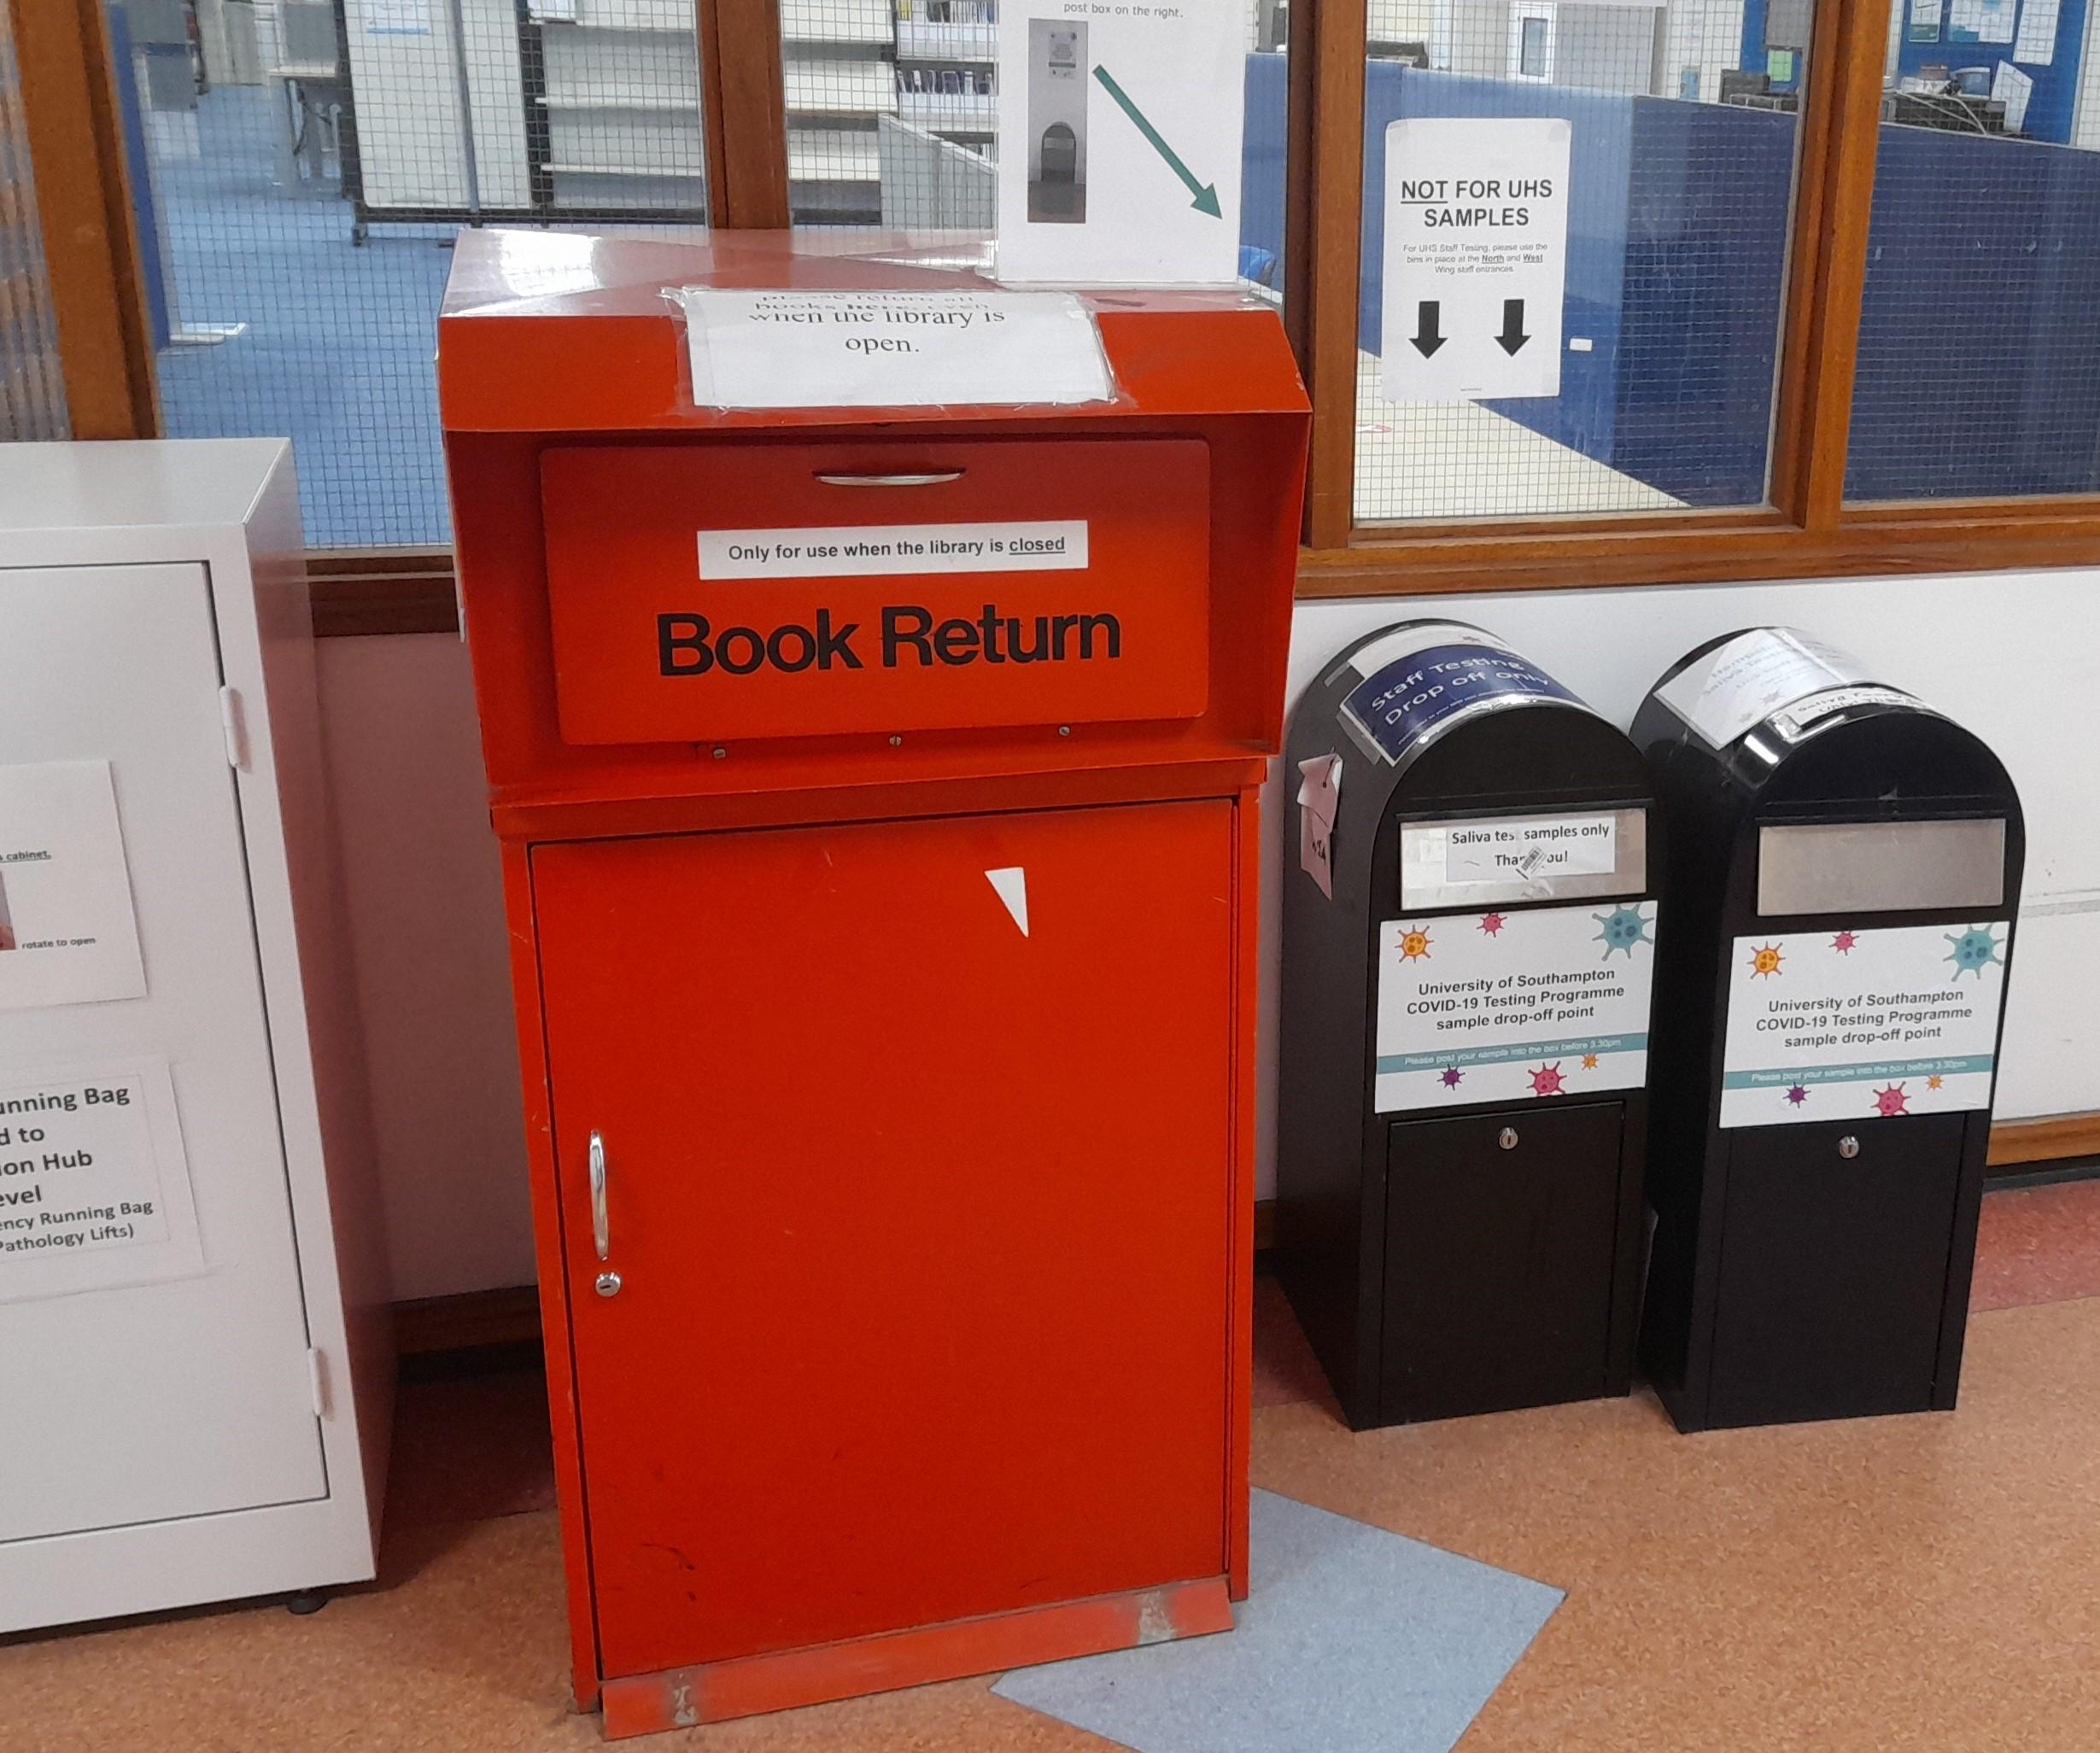 The red book return box